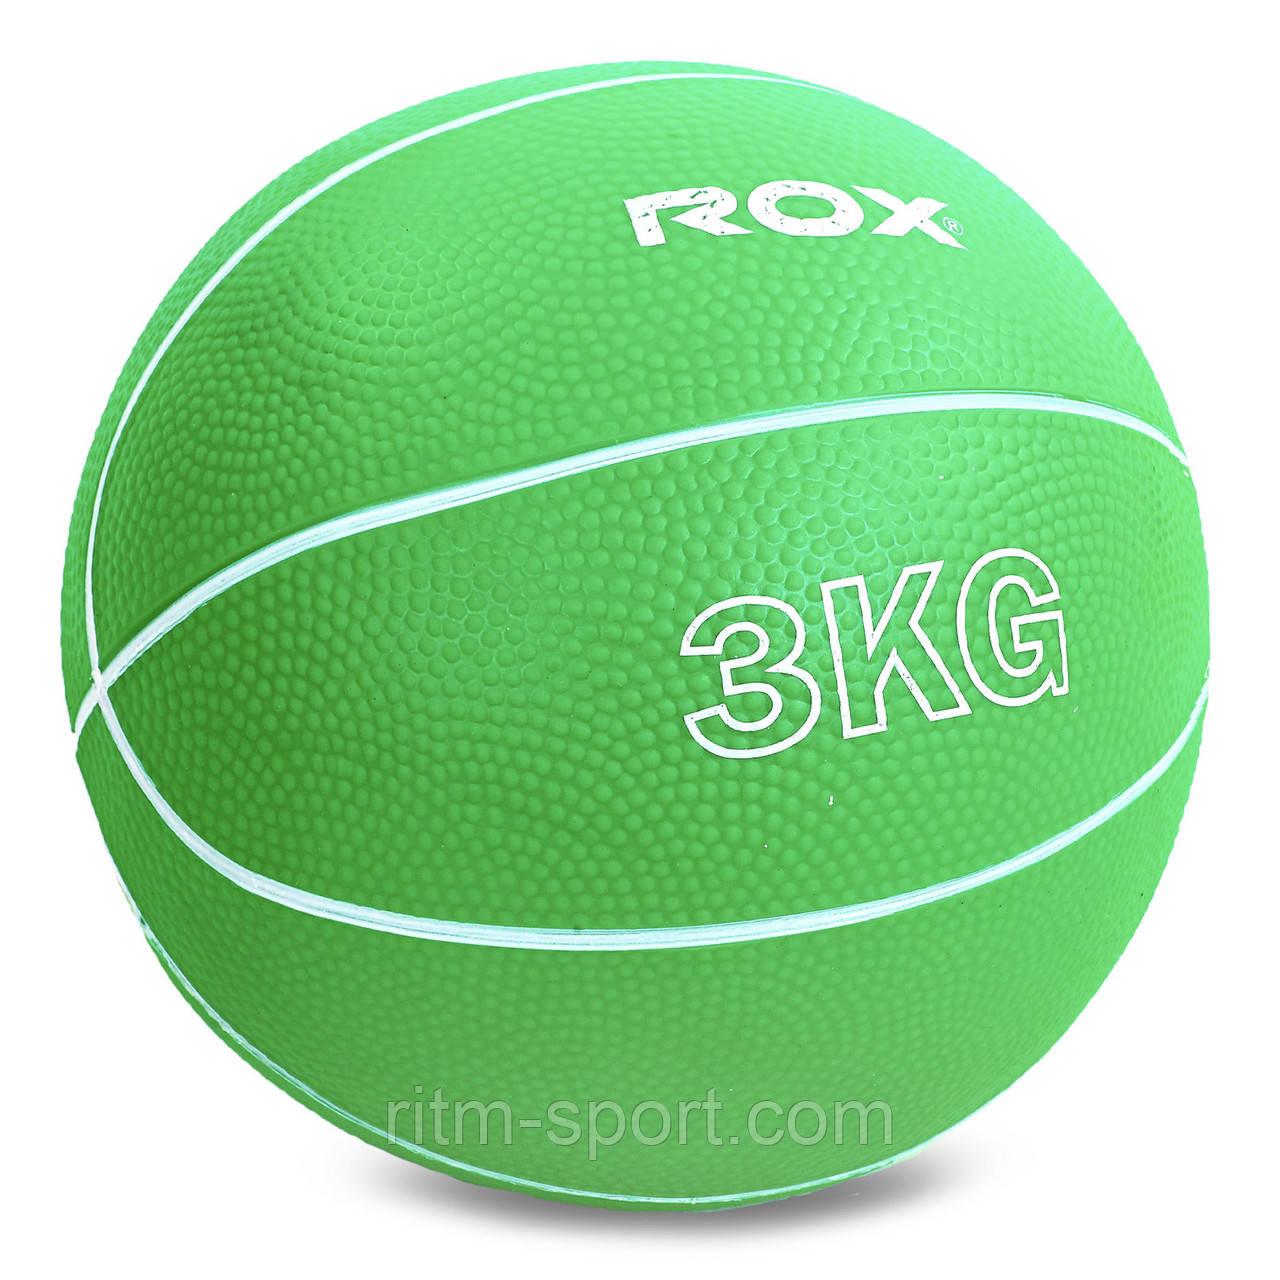 М'яч медичний ( медбол) 3 кг